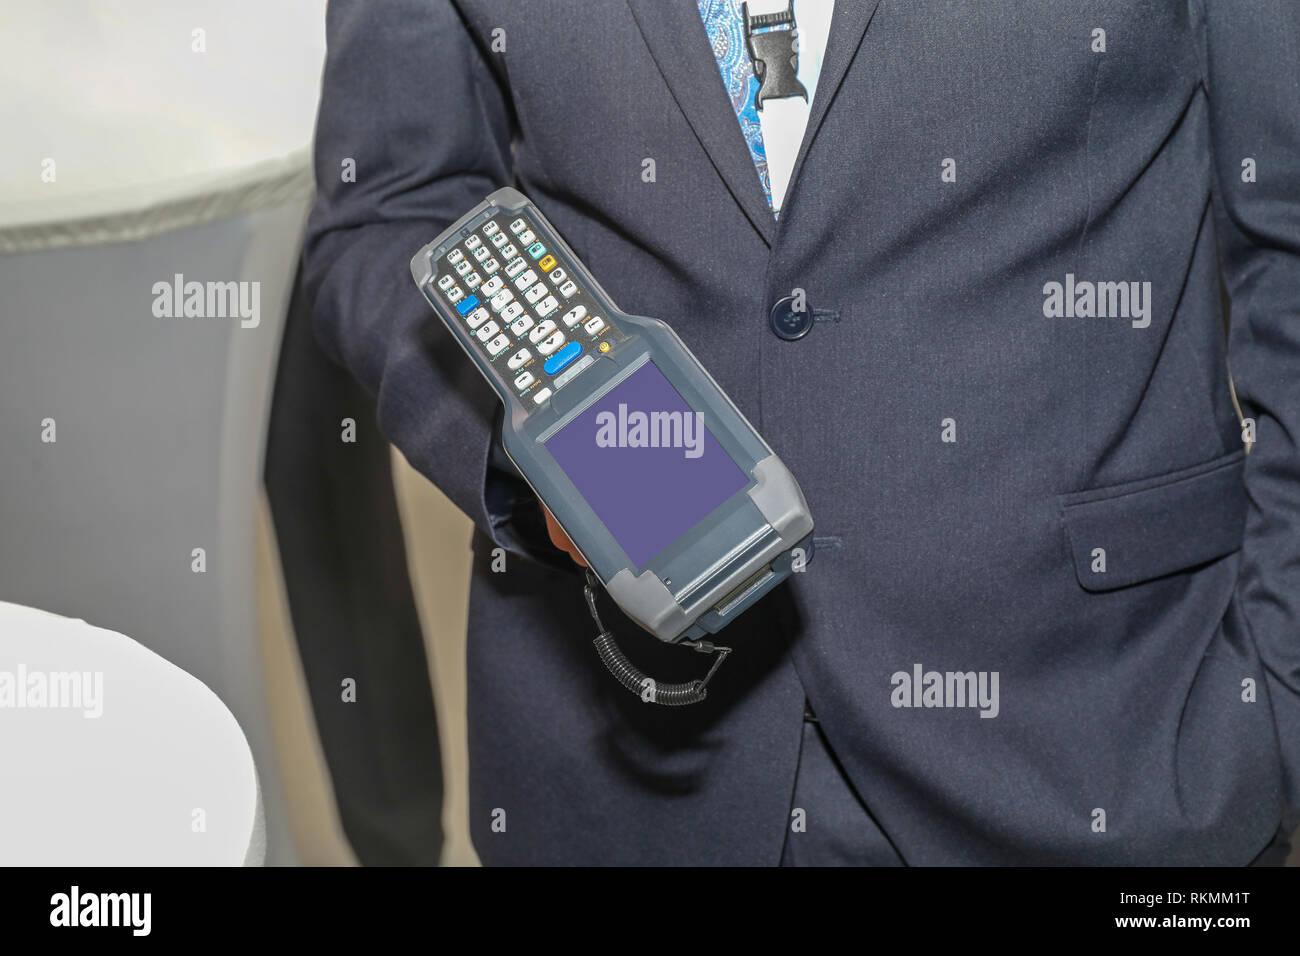 Man Holding Handheld Barcode Scanner Reader Portable Computer - Stock Image